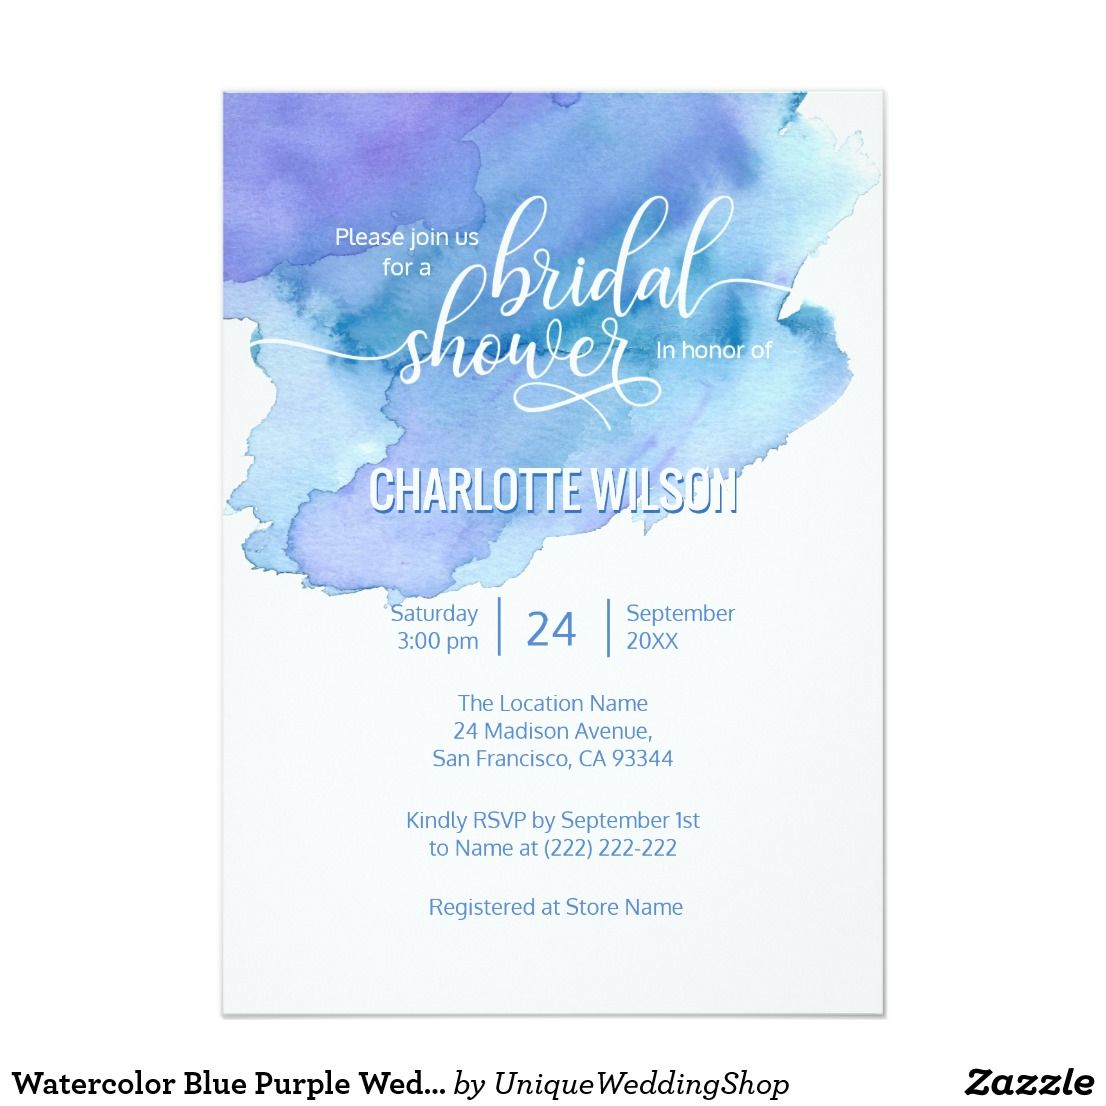 Watercolor Blue Purple Wedding Bridal Shower Invitation   { Wedding ...